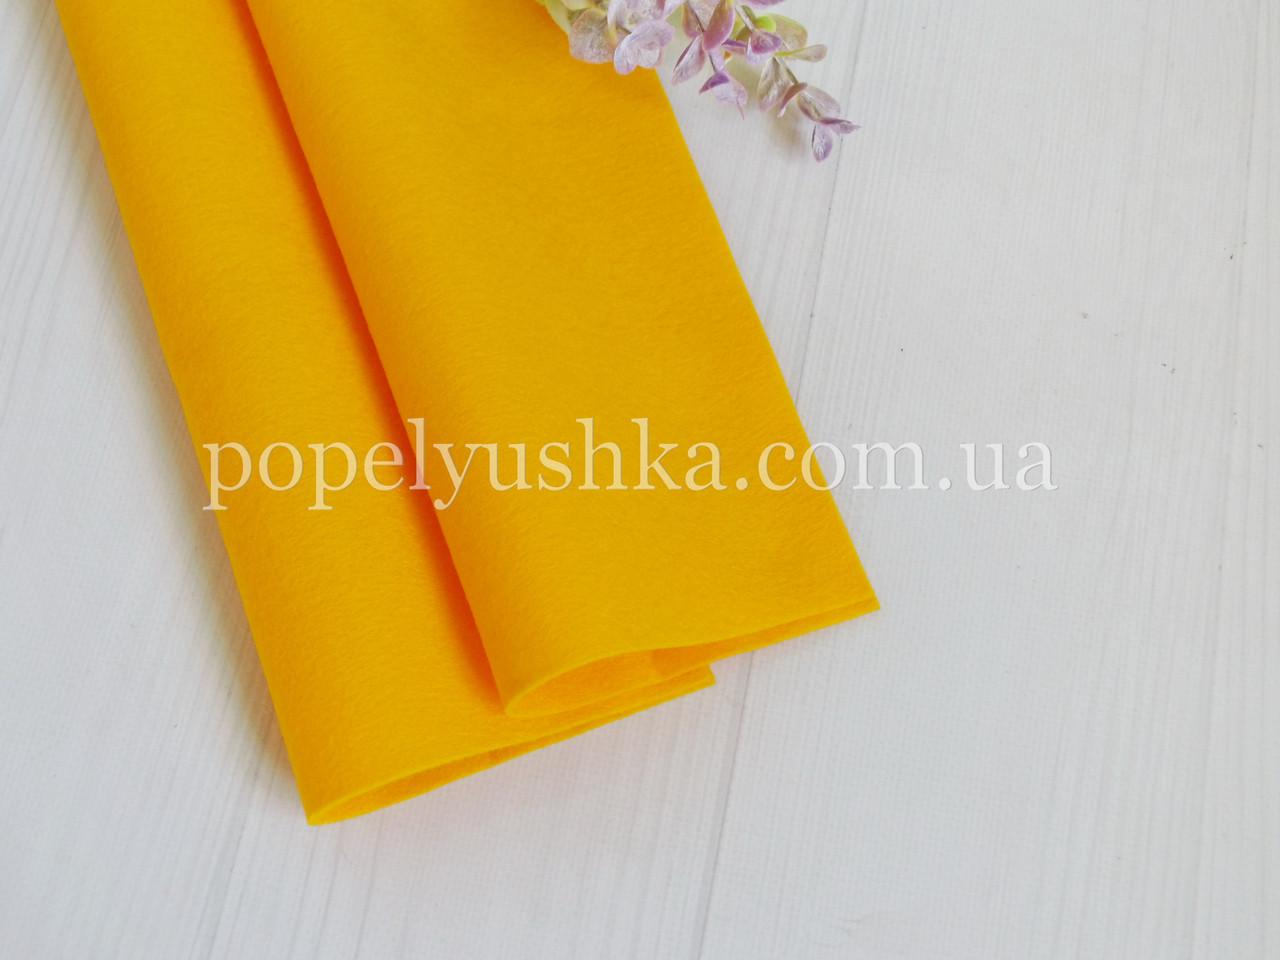 Фетр 1,2 мм мягкий корейский насыщенно-желтый 22 * 30 см